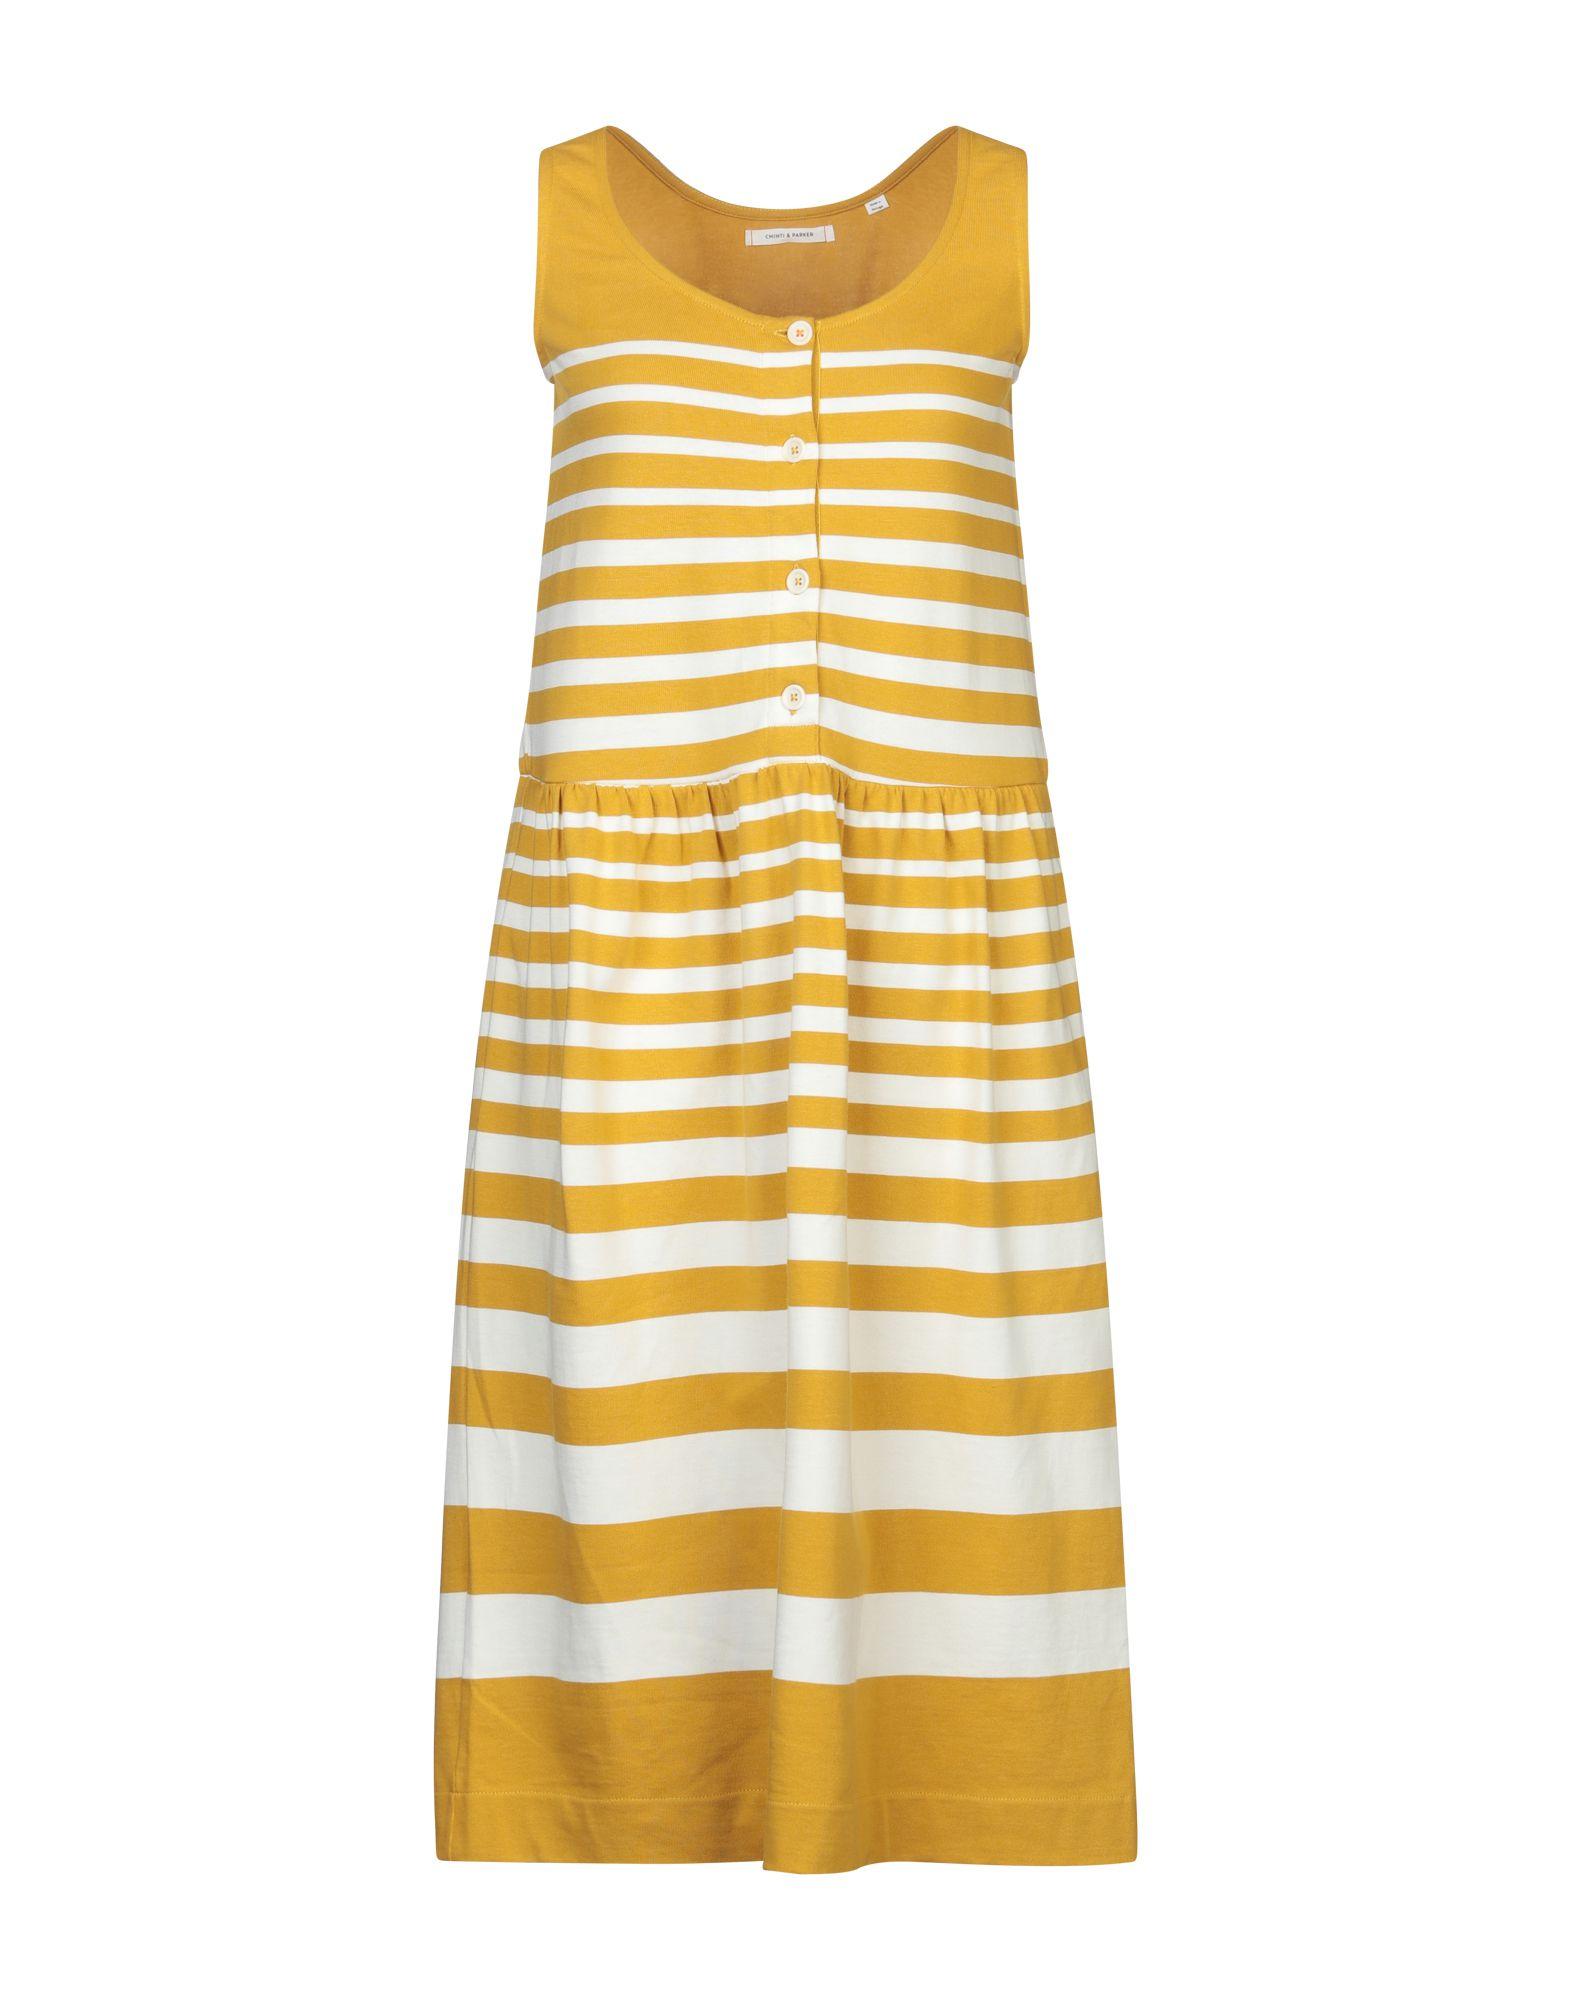 Фото - CHINTI AND PARKER Платье длиной 3/4 chinti and parker топ без рукавов